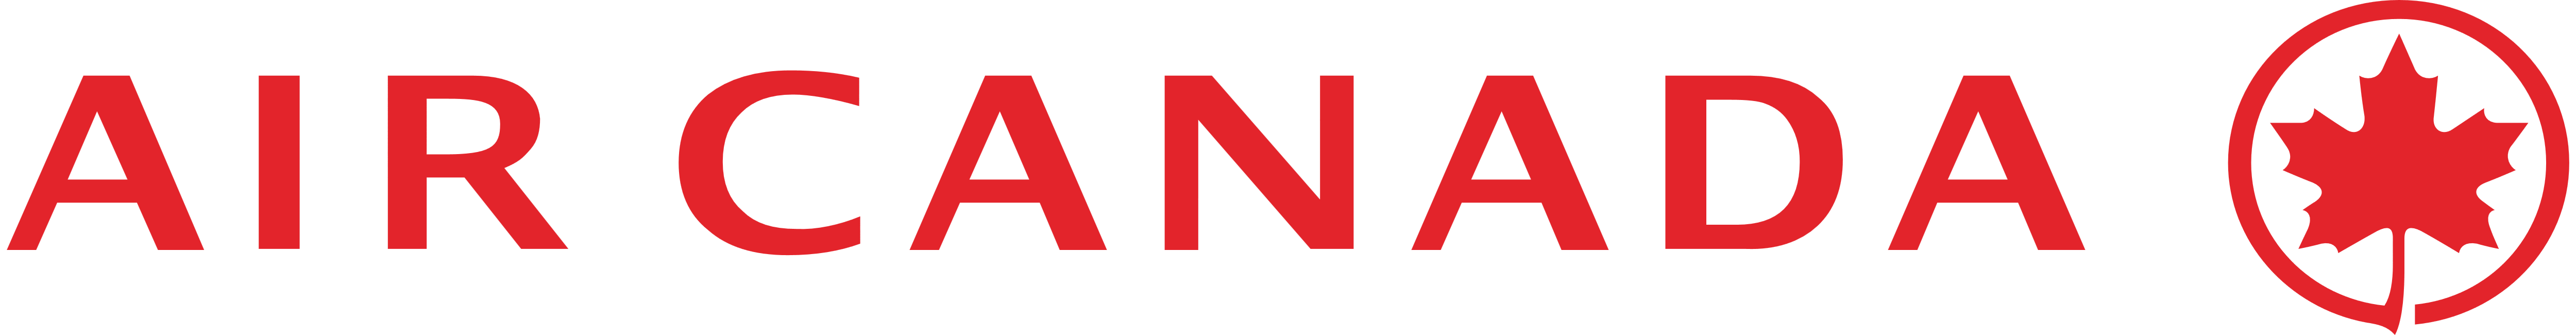 [Image: Air_Canada_logo_1.png]